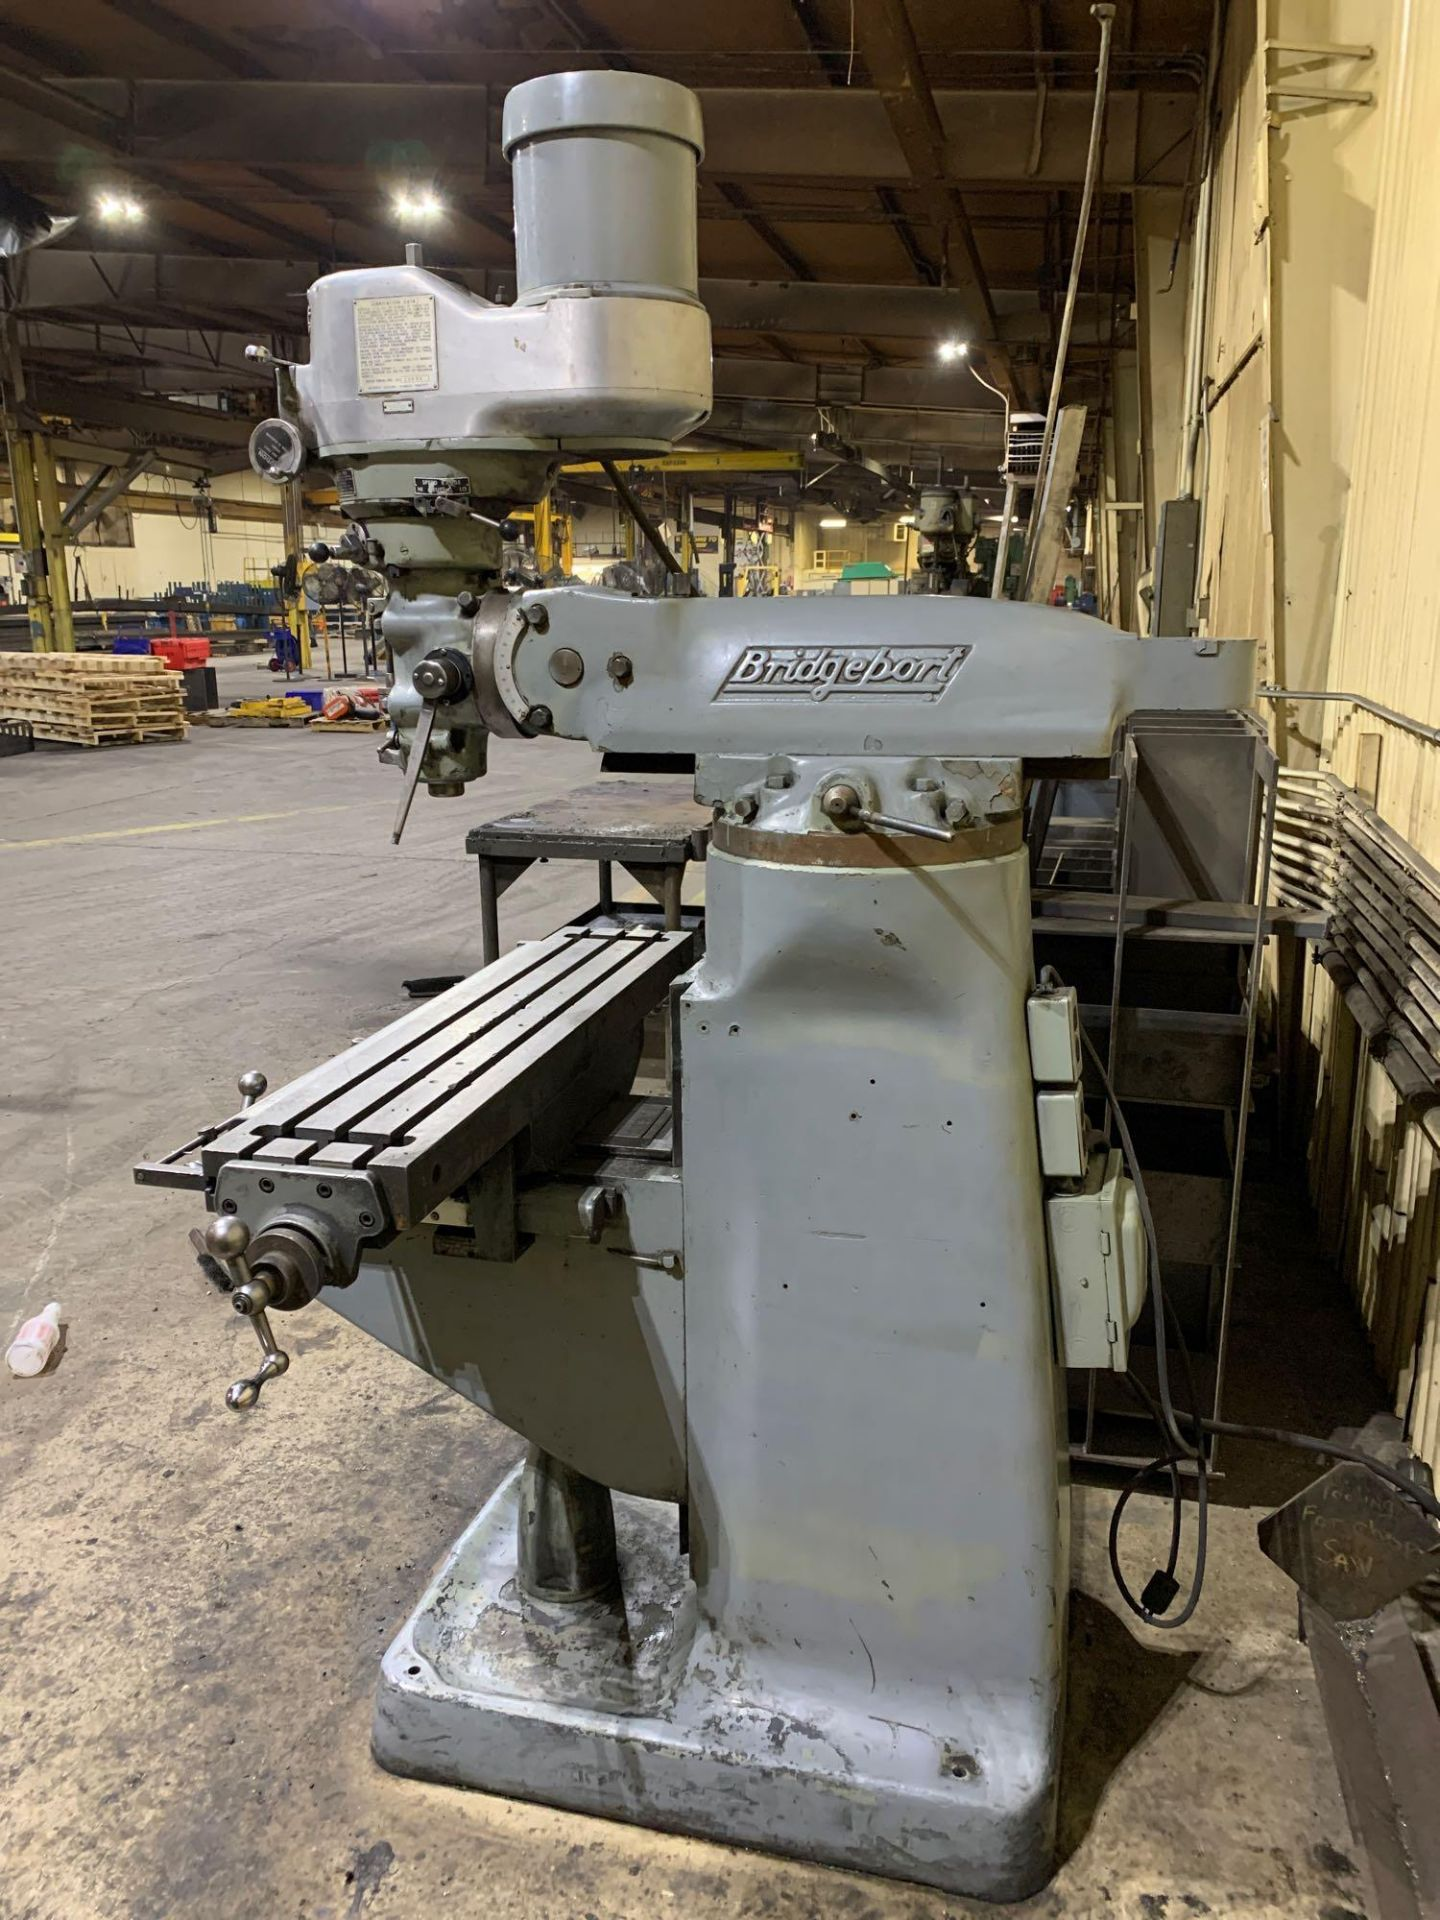 "Bridgeport 2J Vertical Milling Machine Variable Speed Head S/N 132833 CAPACITIES Table size: 9"" X 42 - Image 6 of 12"